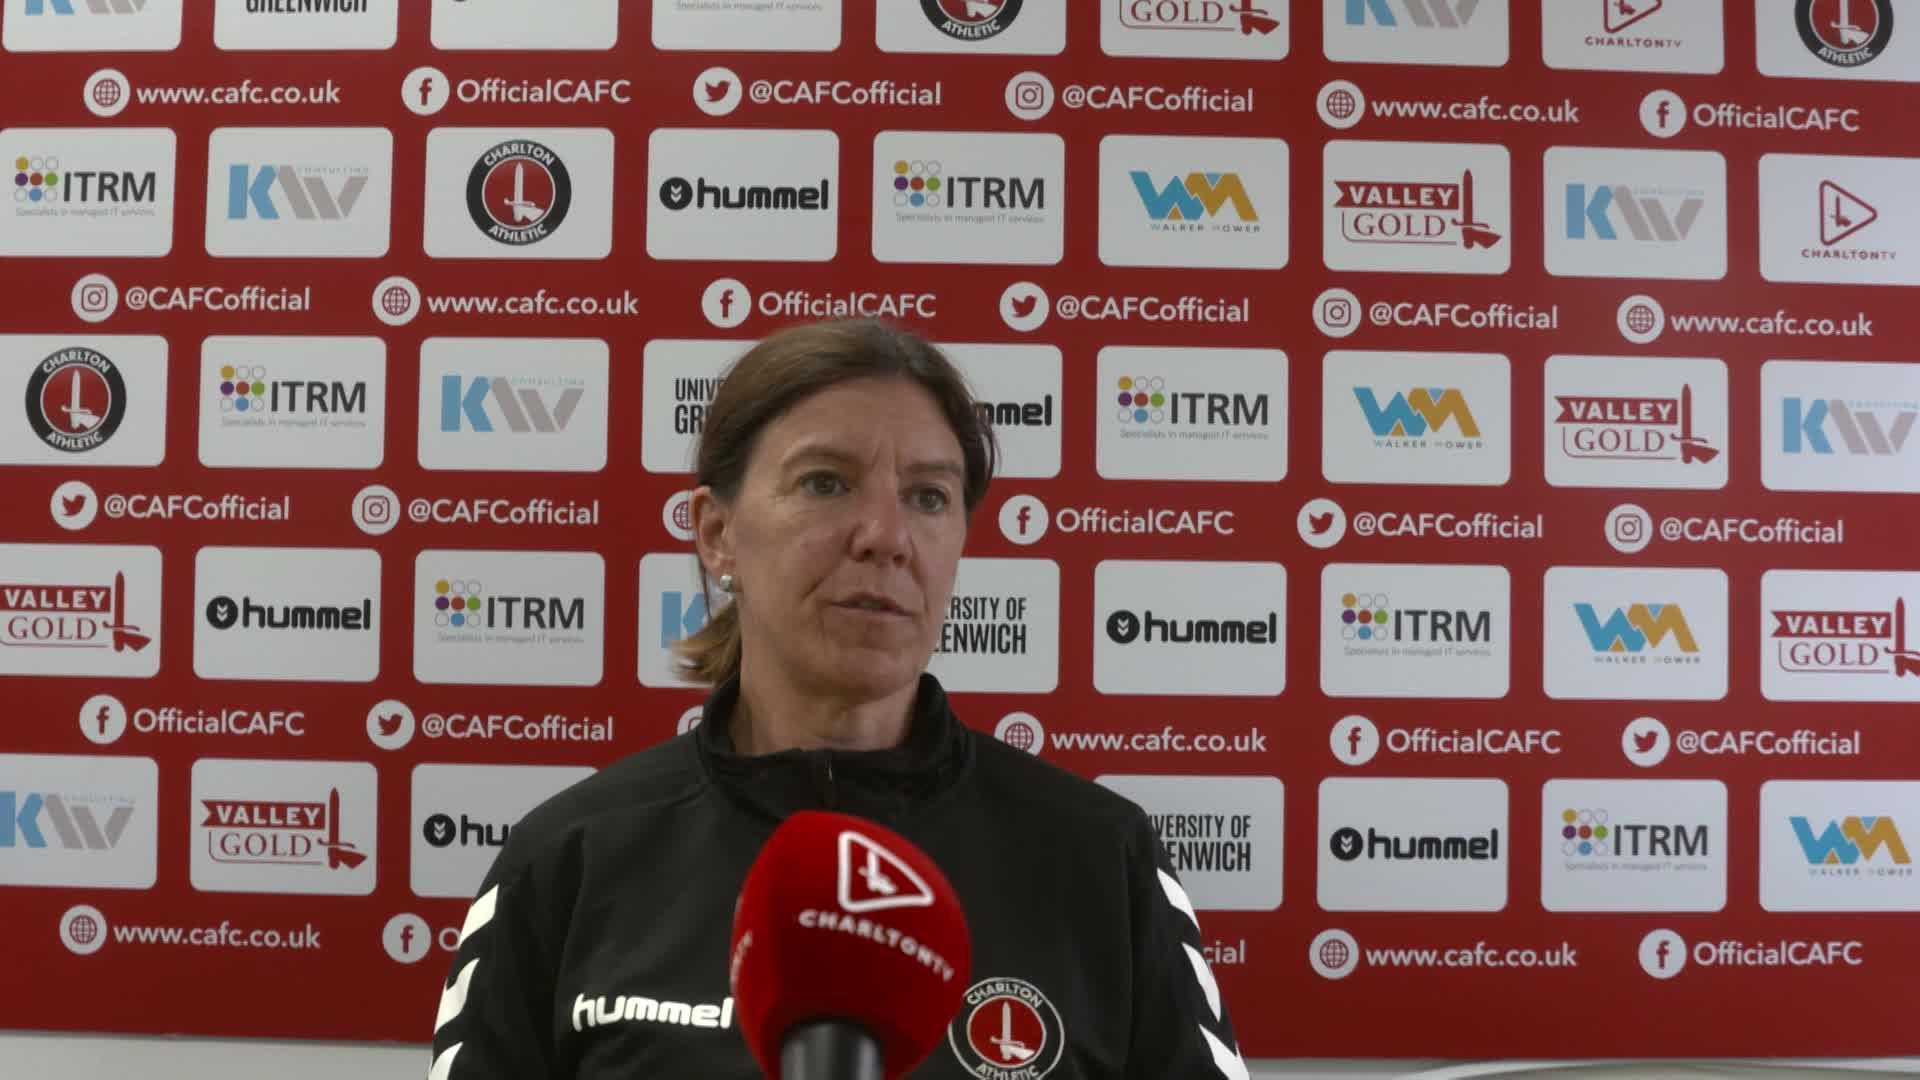 Karen Hills' pre-Coventry United press conference (September 2021)